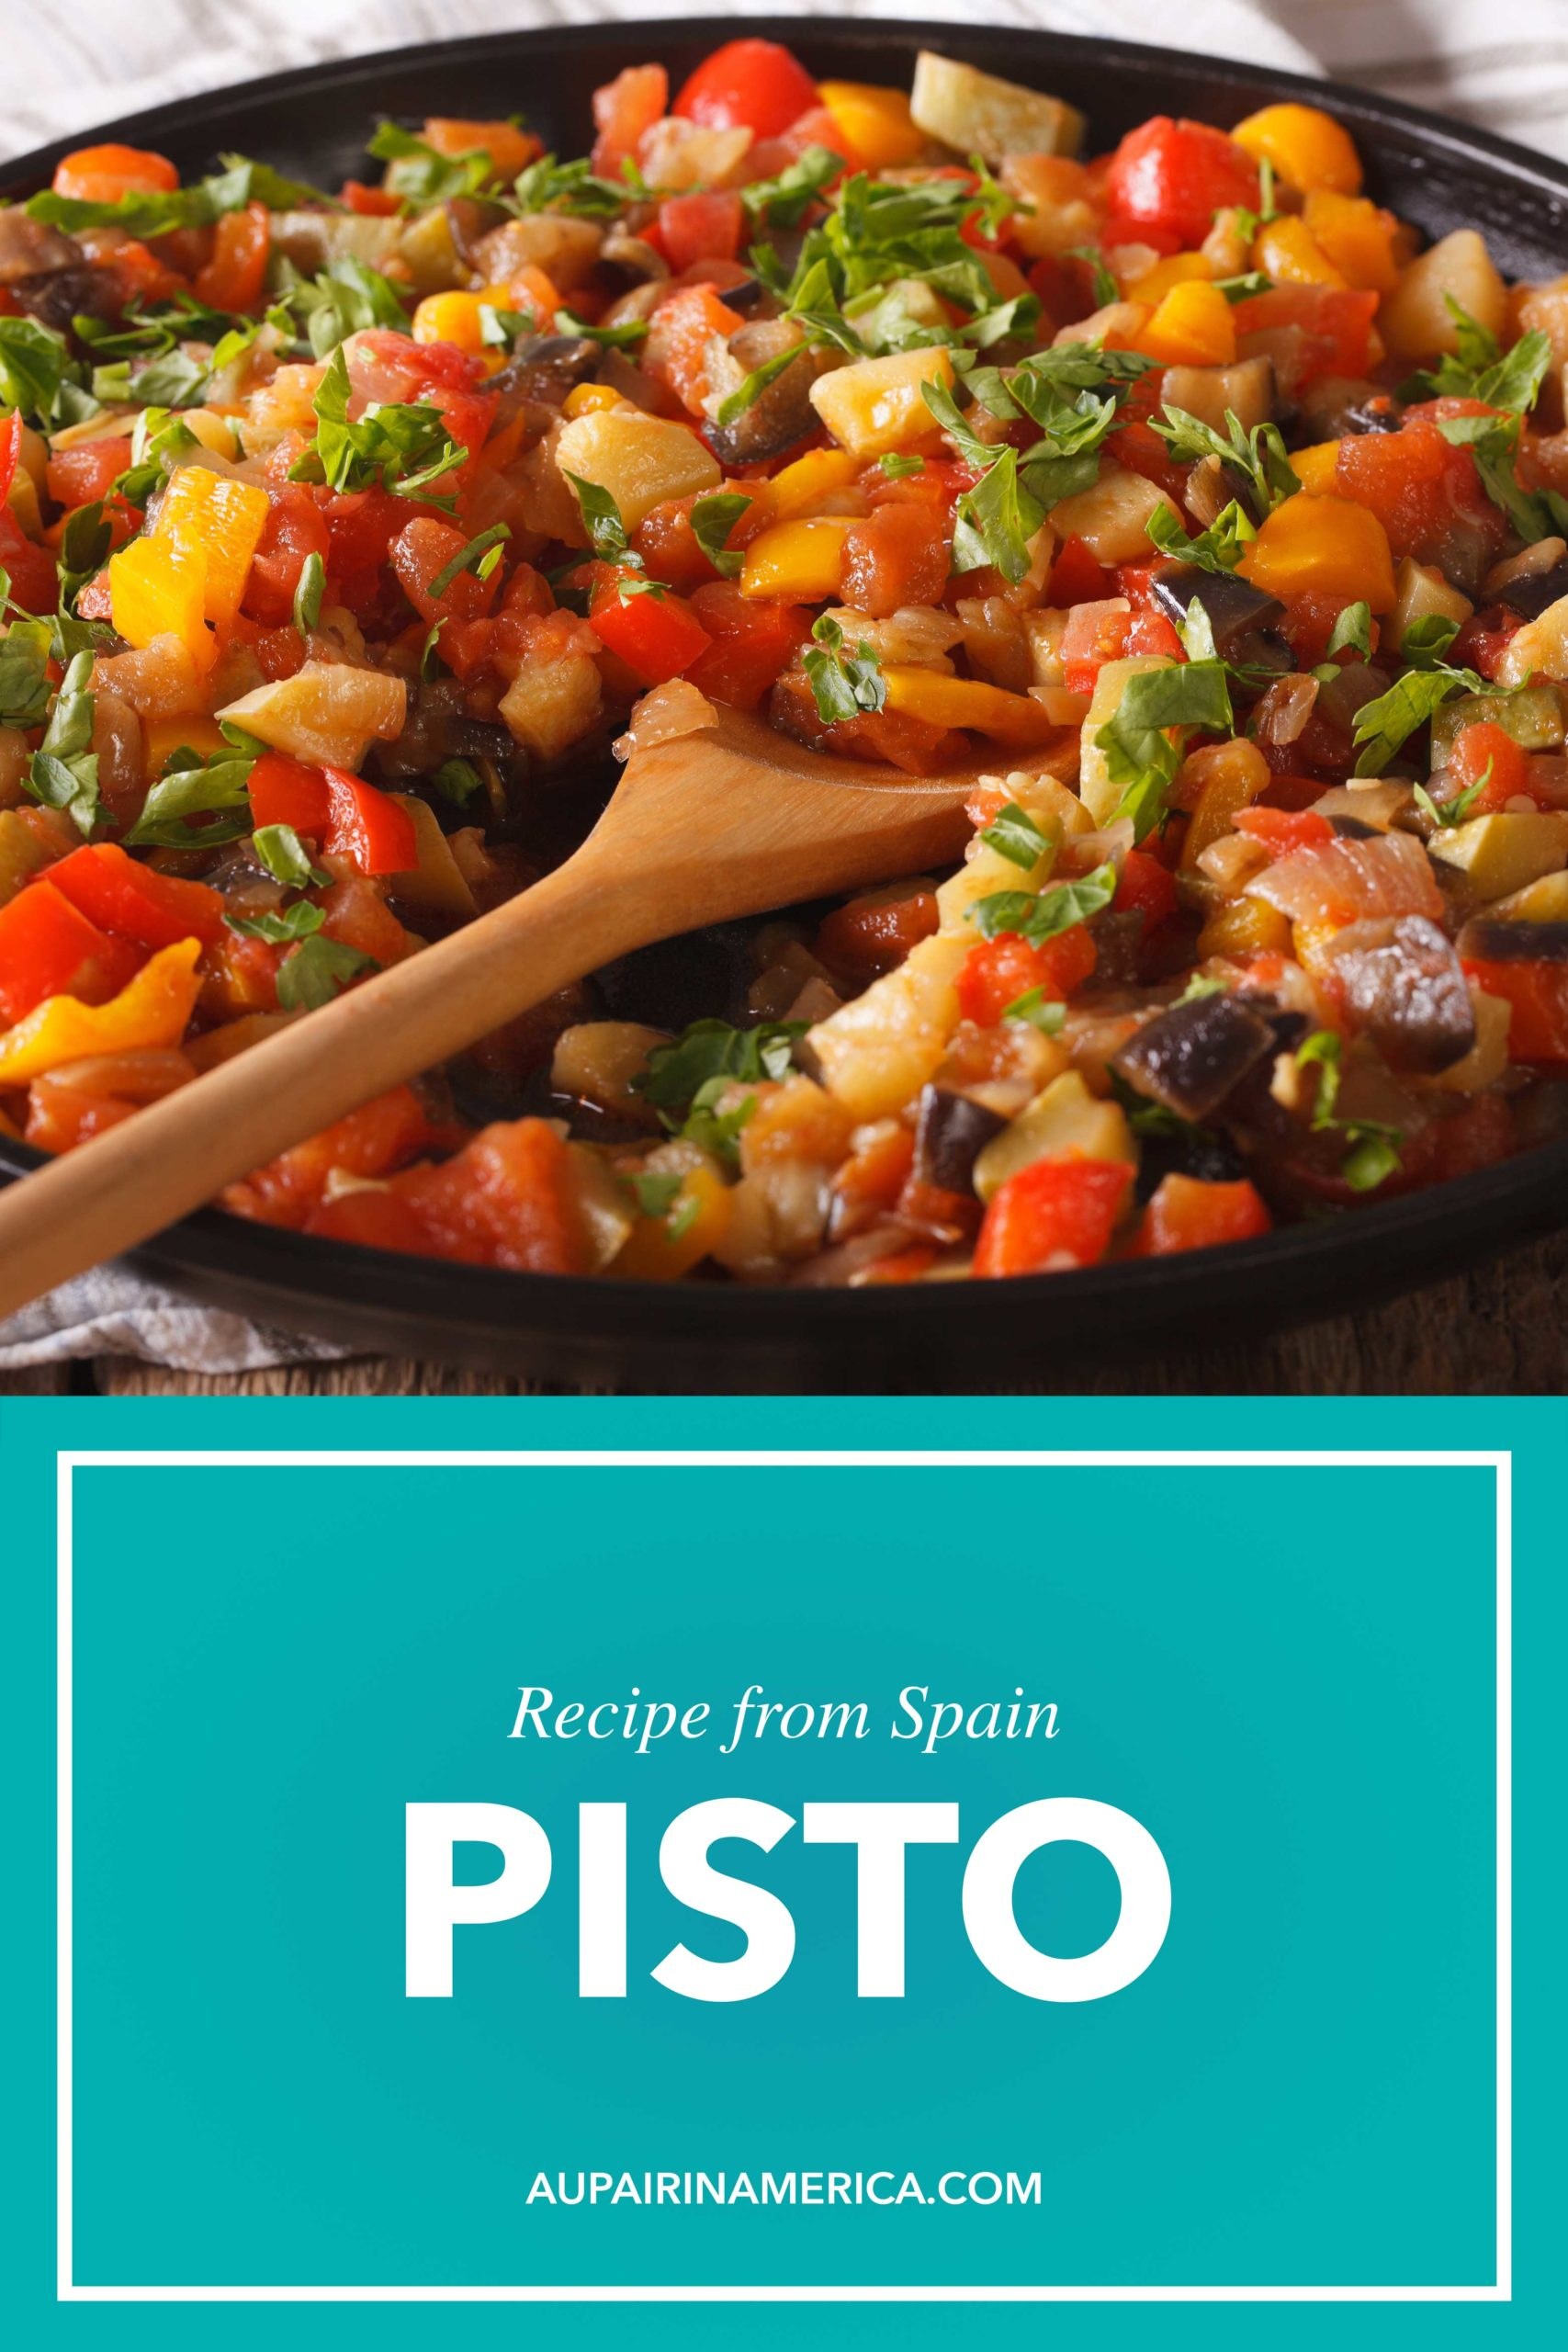 Spanish pisto